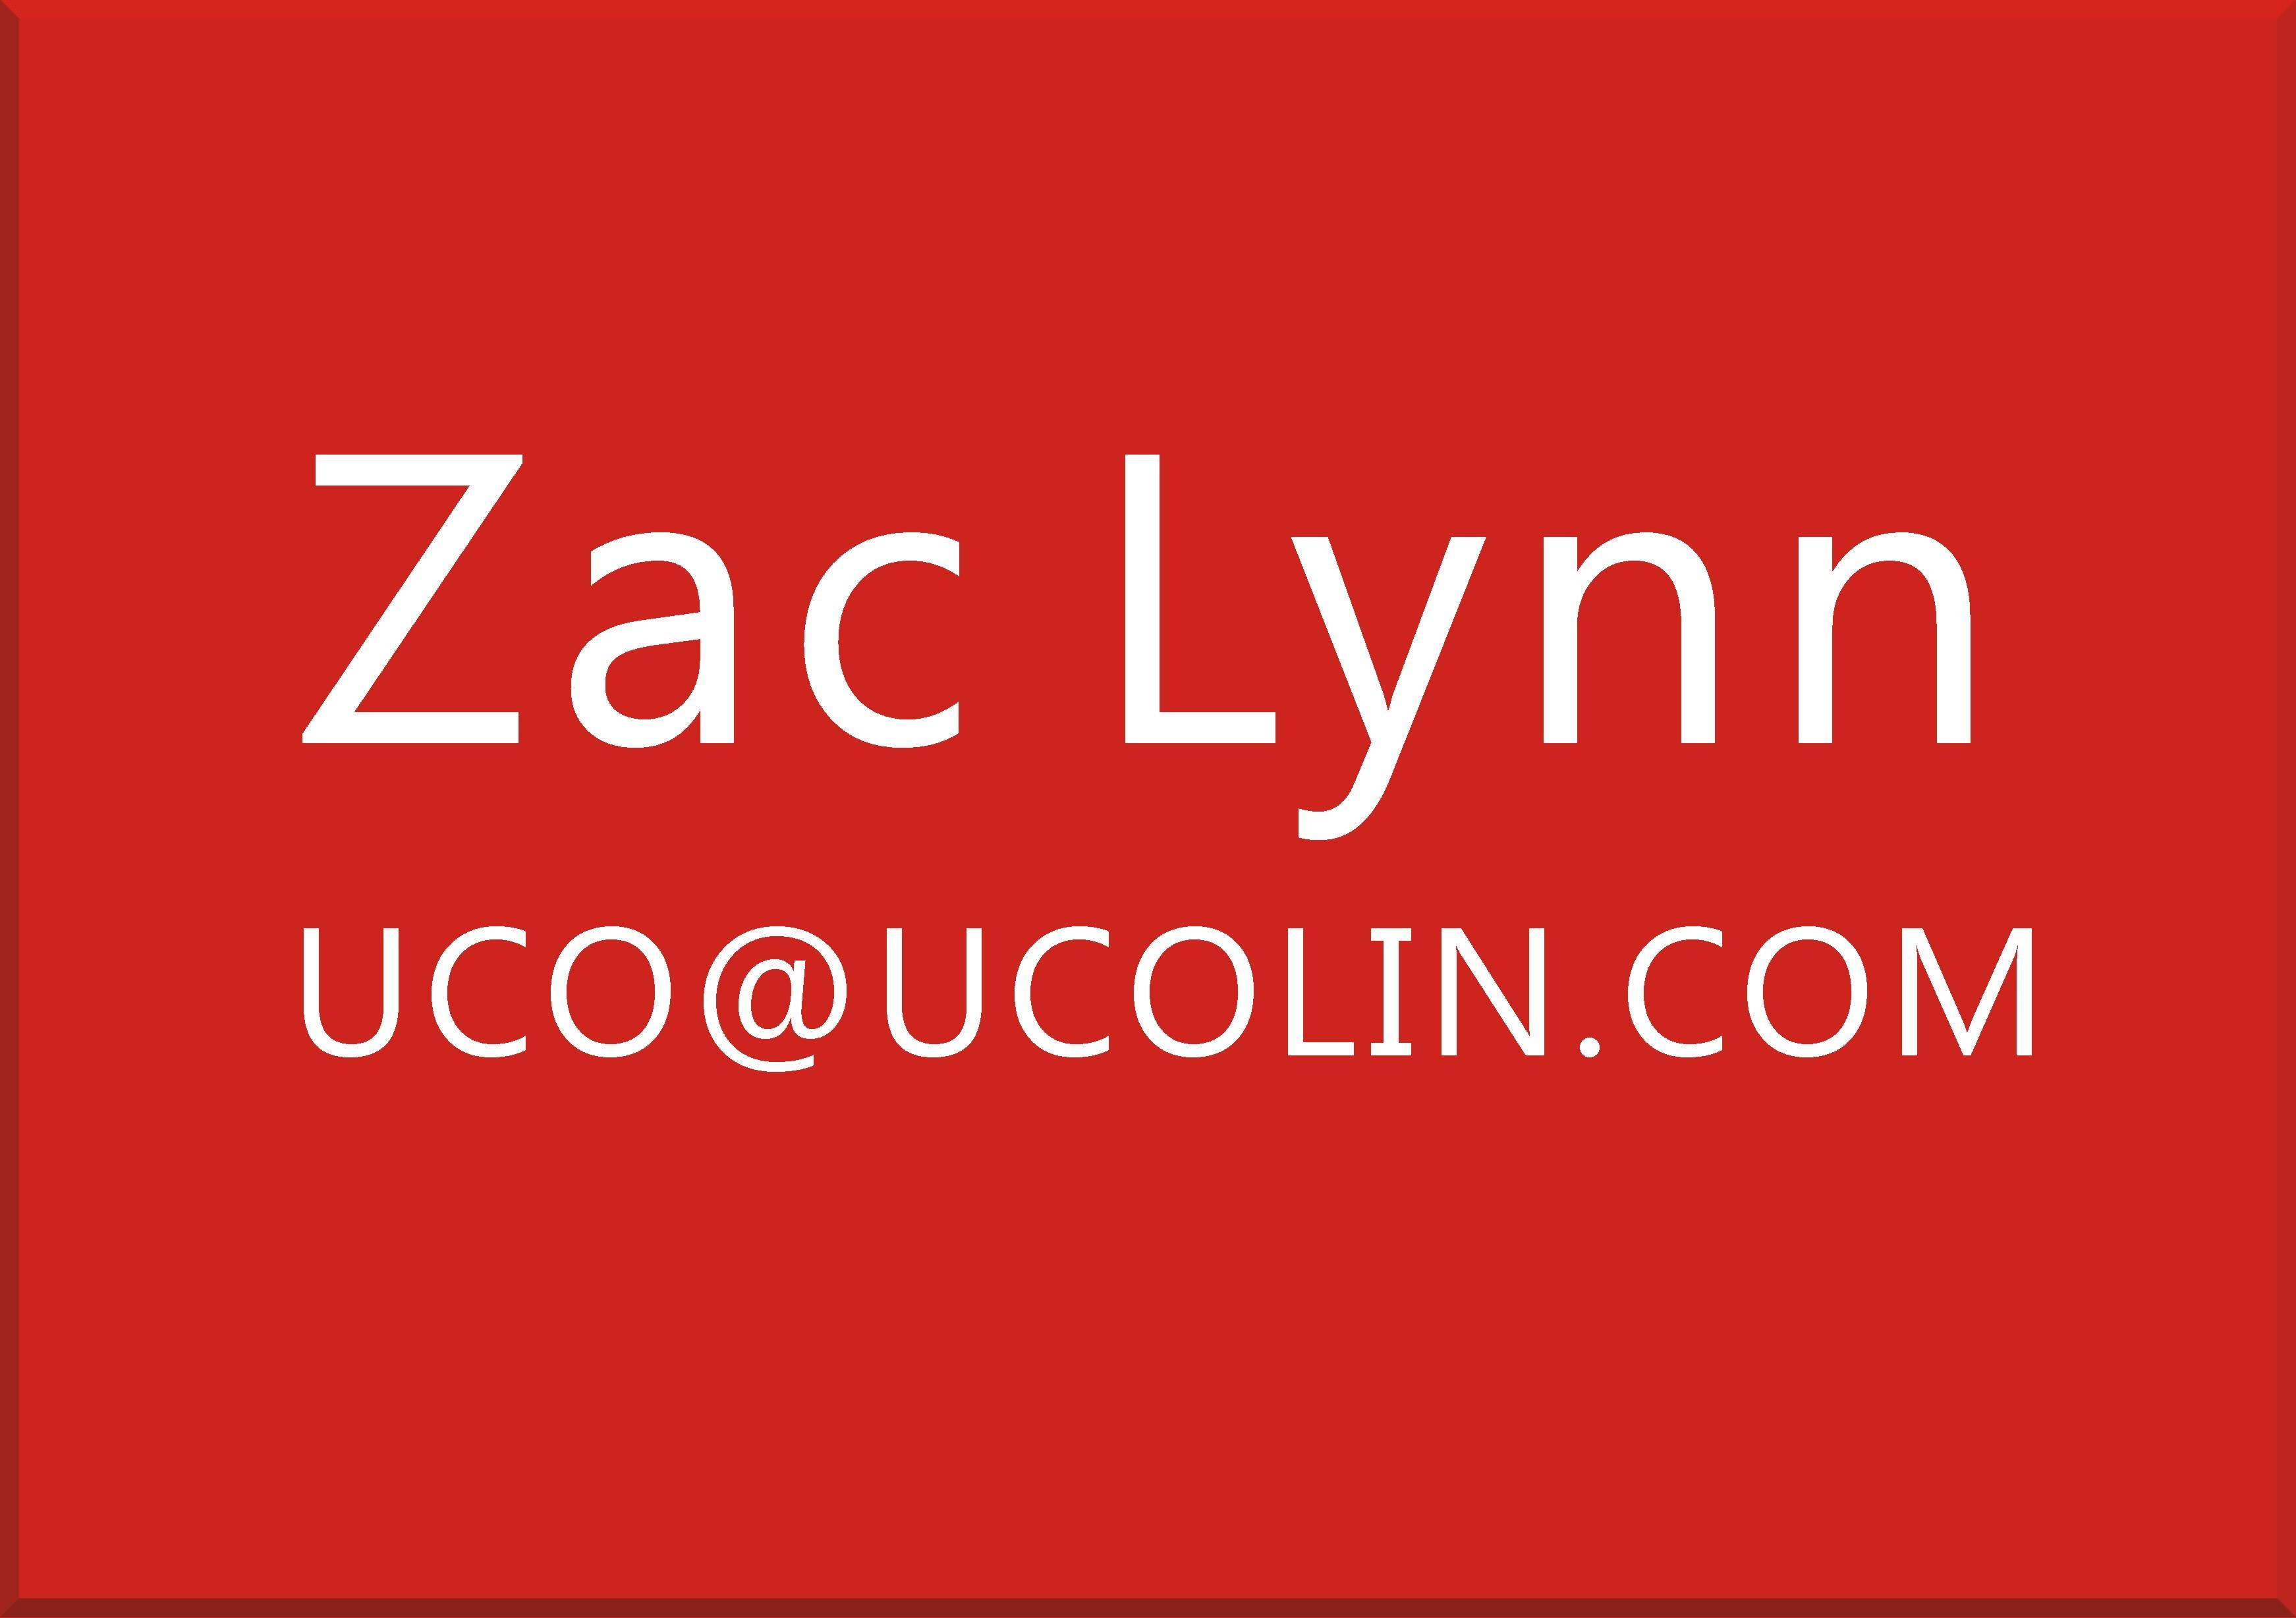 ZAC LYNN  UCO@UCOLIN.COM